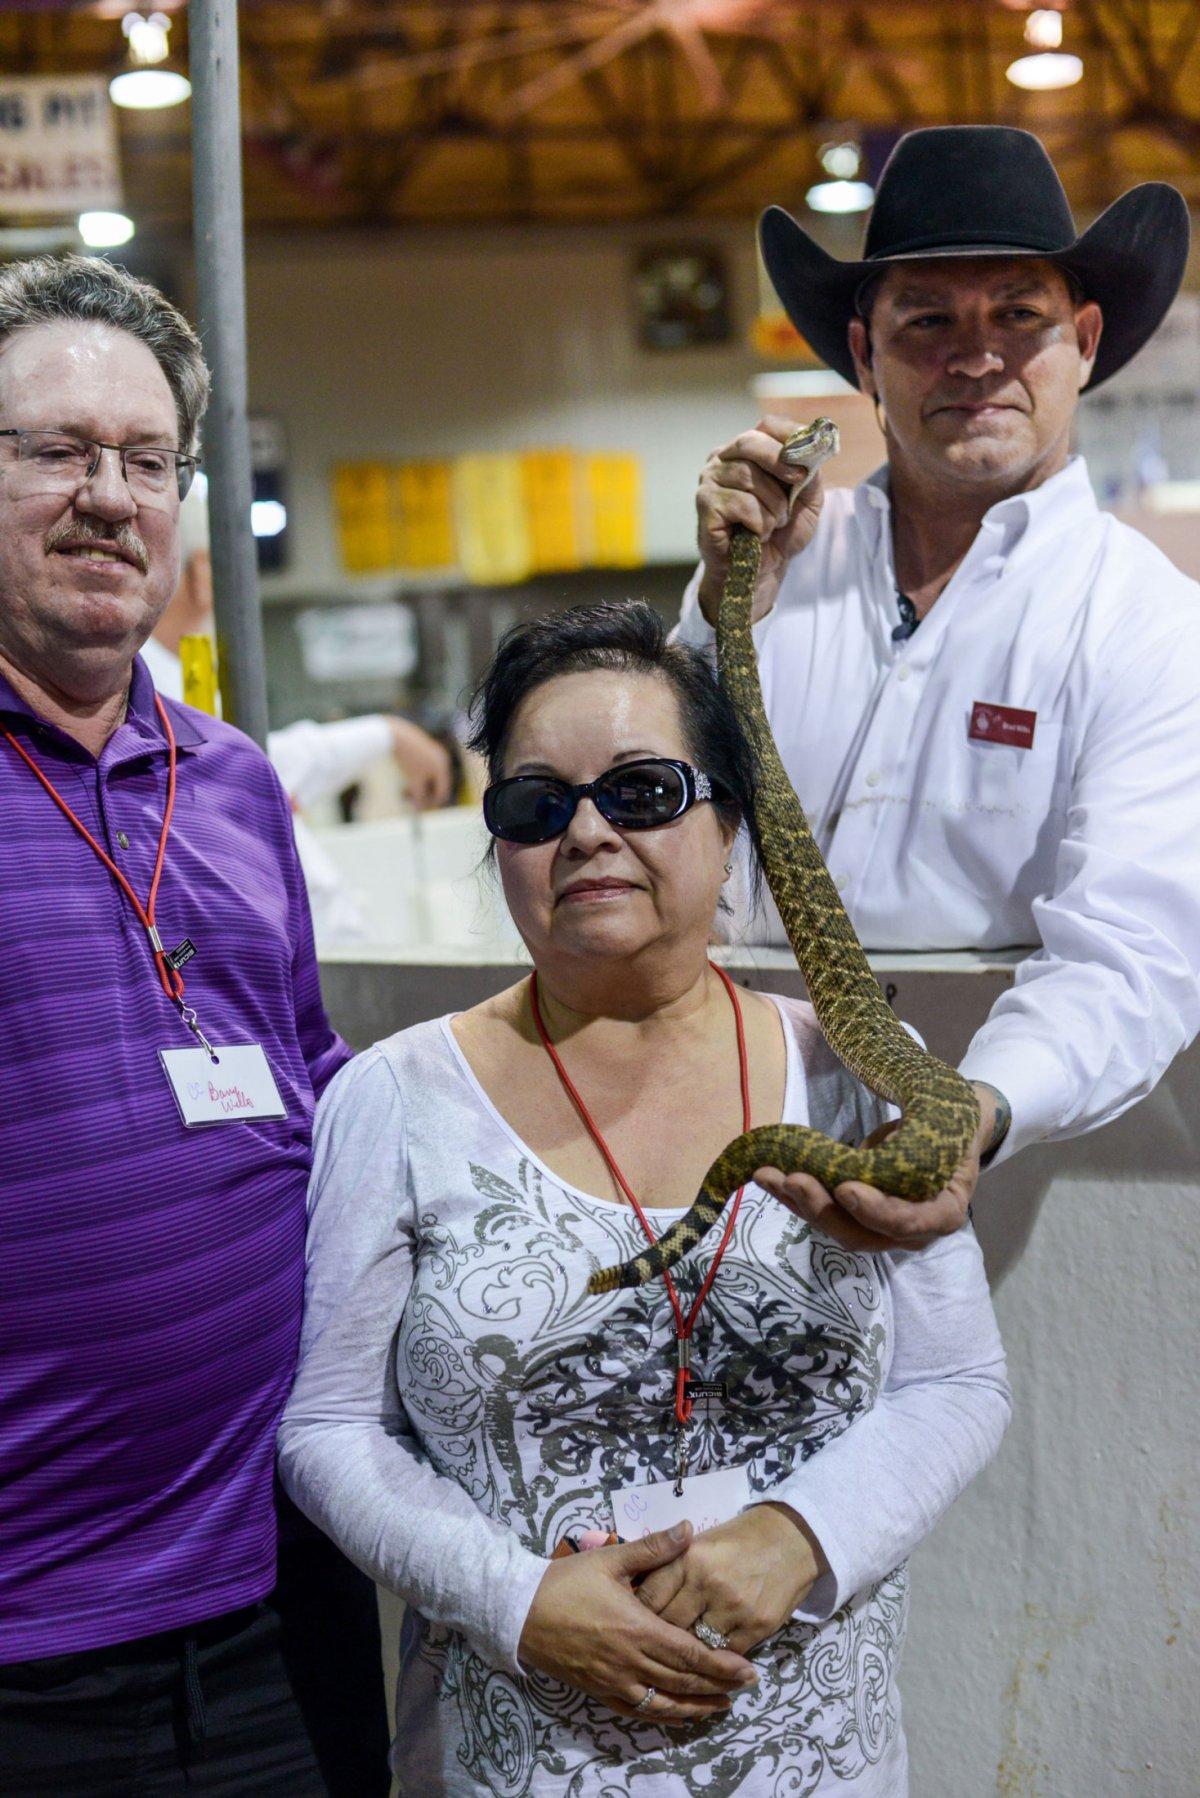 Rattlesnake Presentations